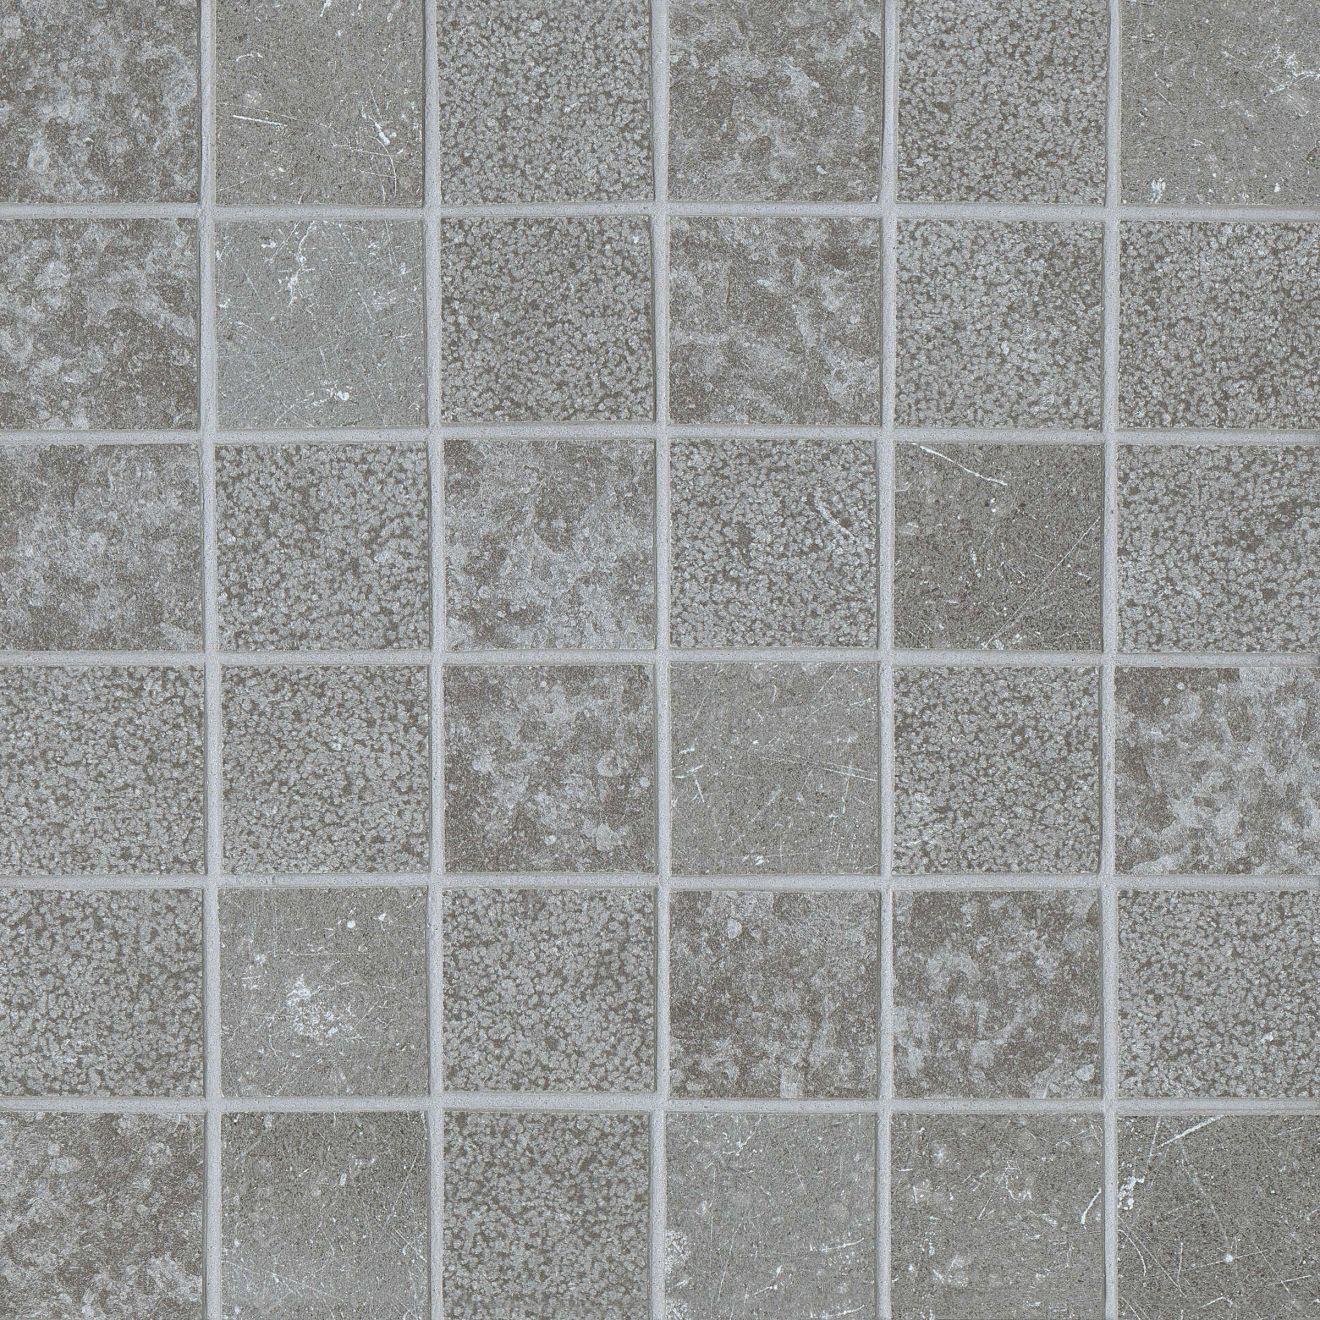 "Blues 2"" x 2"" Floor & Wall Mosaic in Core"